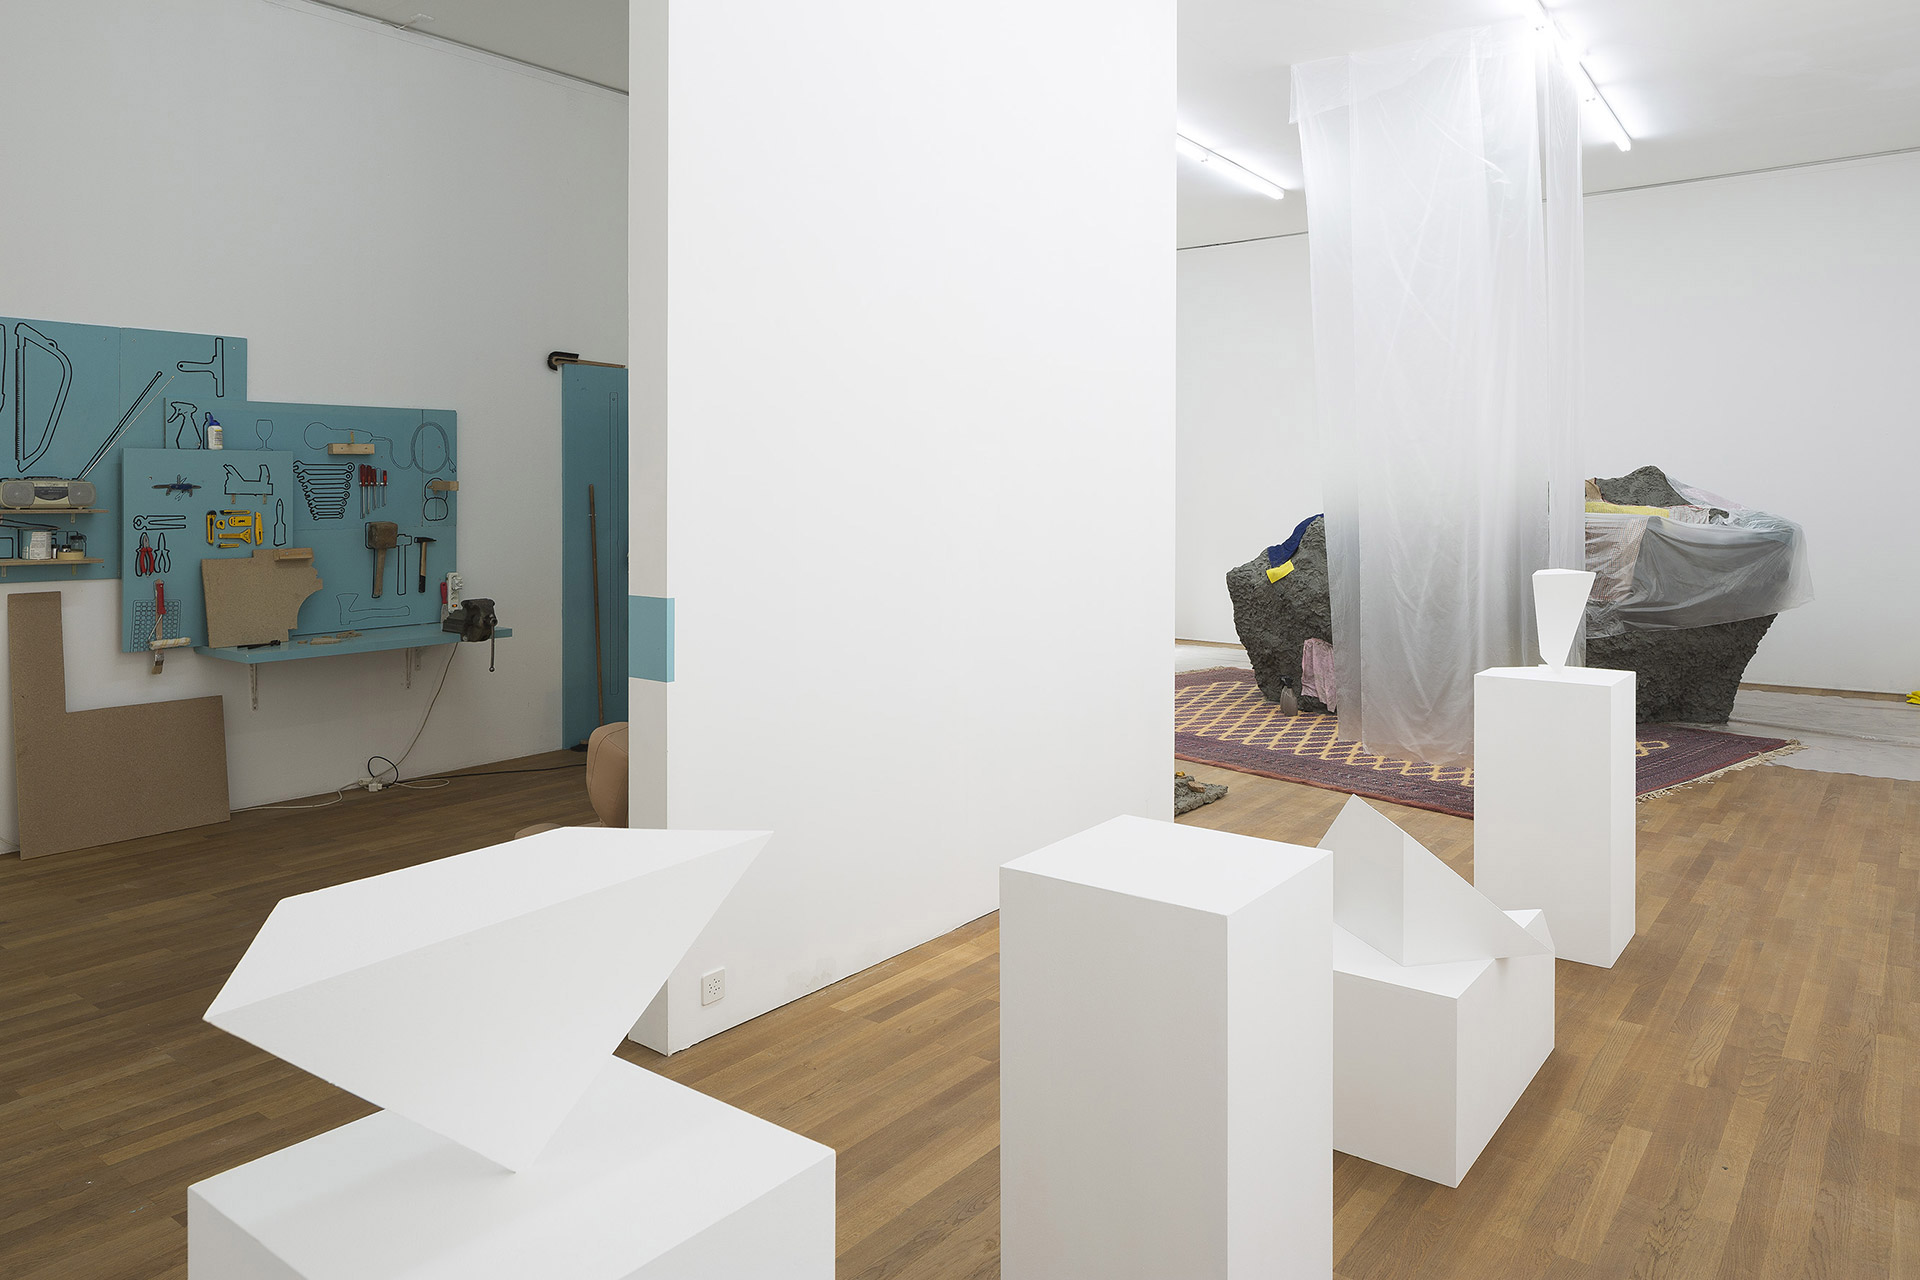 Gianin-Conrad-Kunsthalle-Winterthur-2015-3.jpg